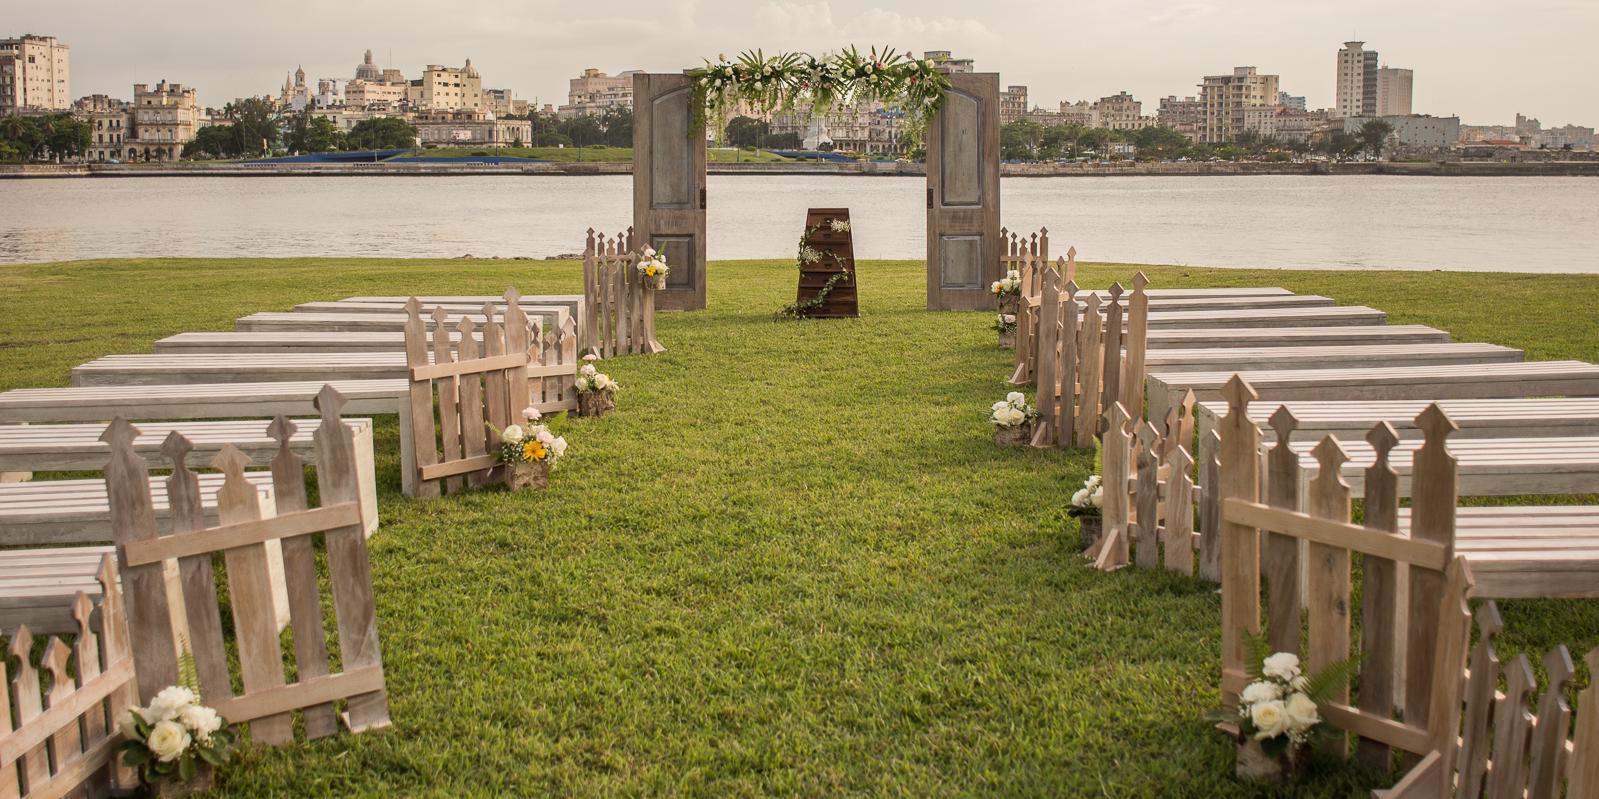 bodas-estilo-libre-jardin-cuba-8761.jpg